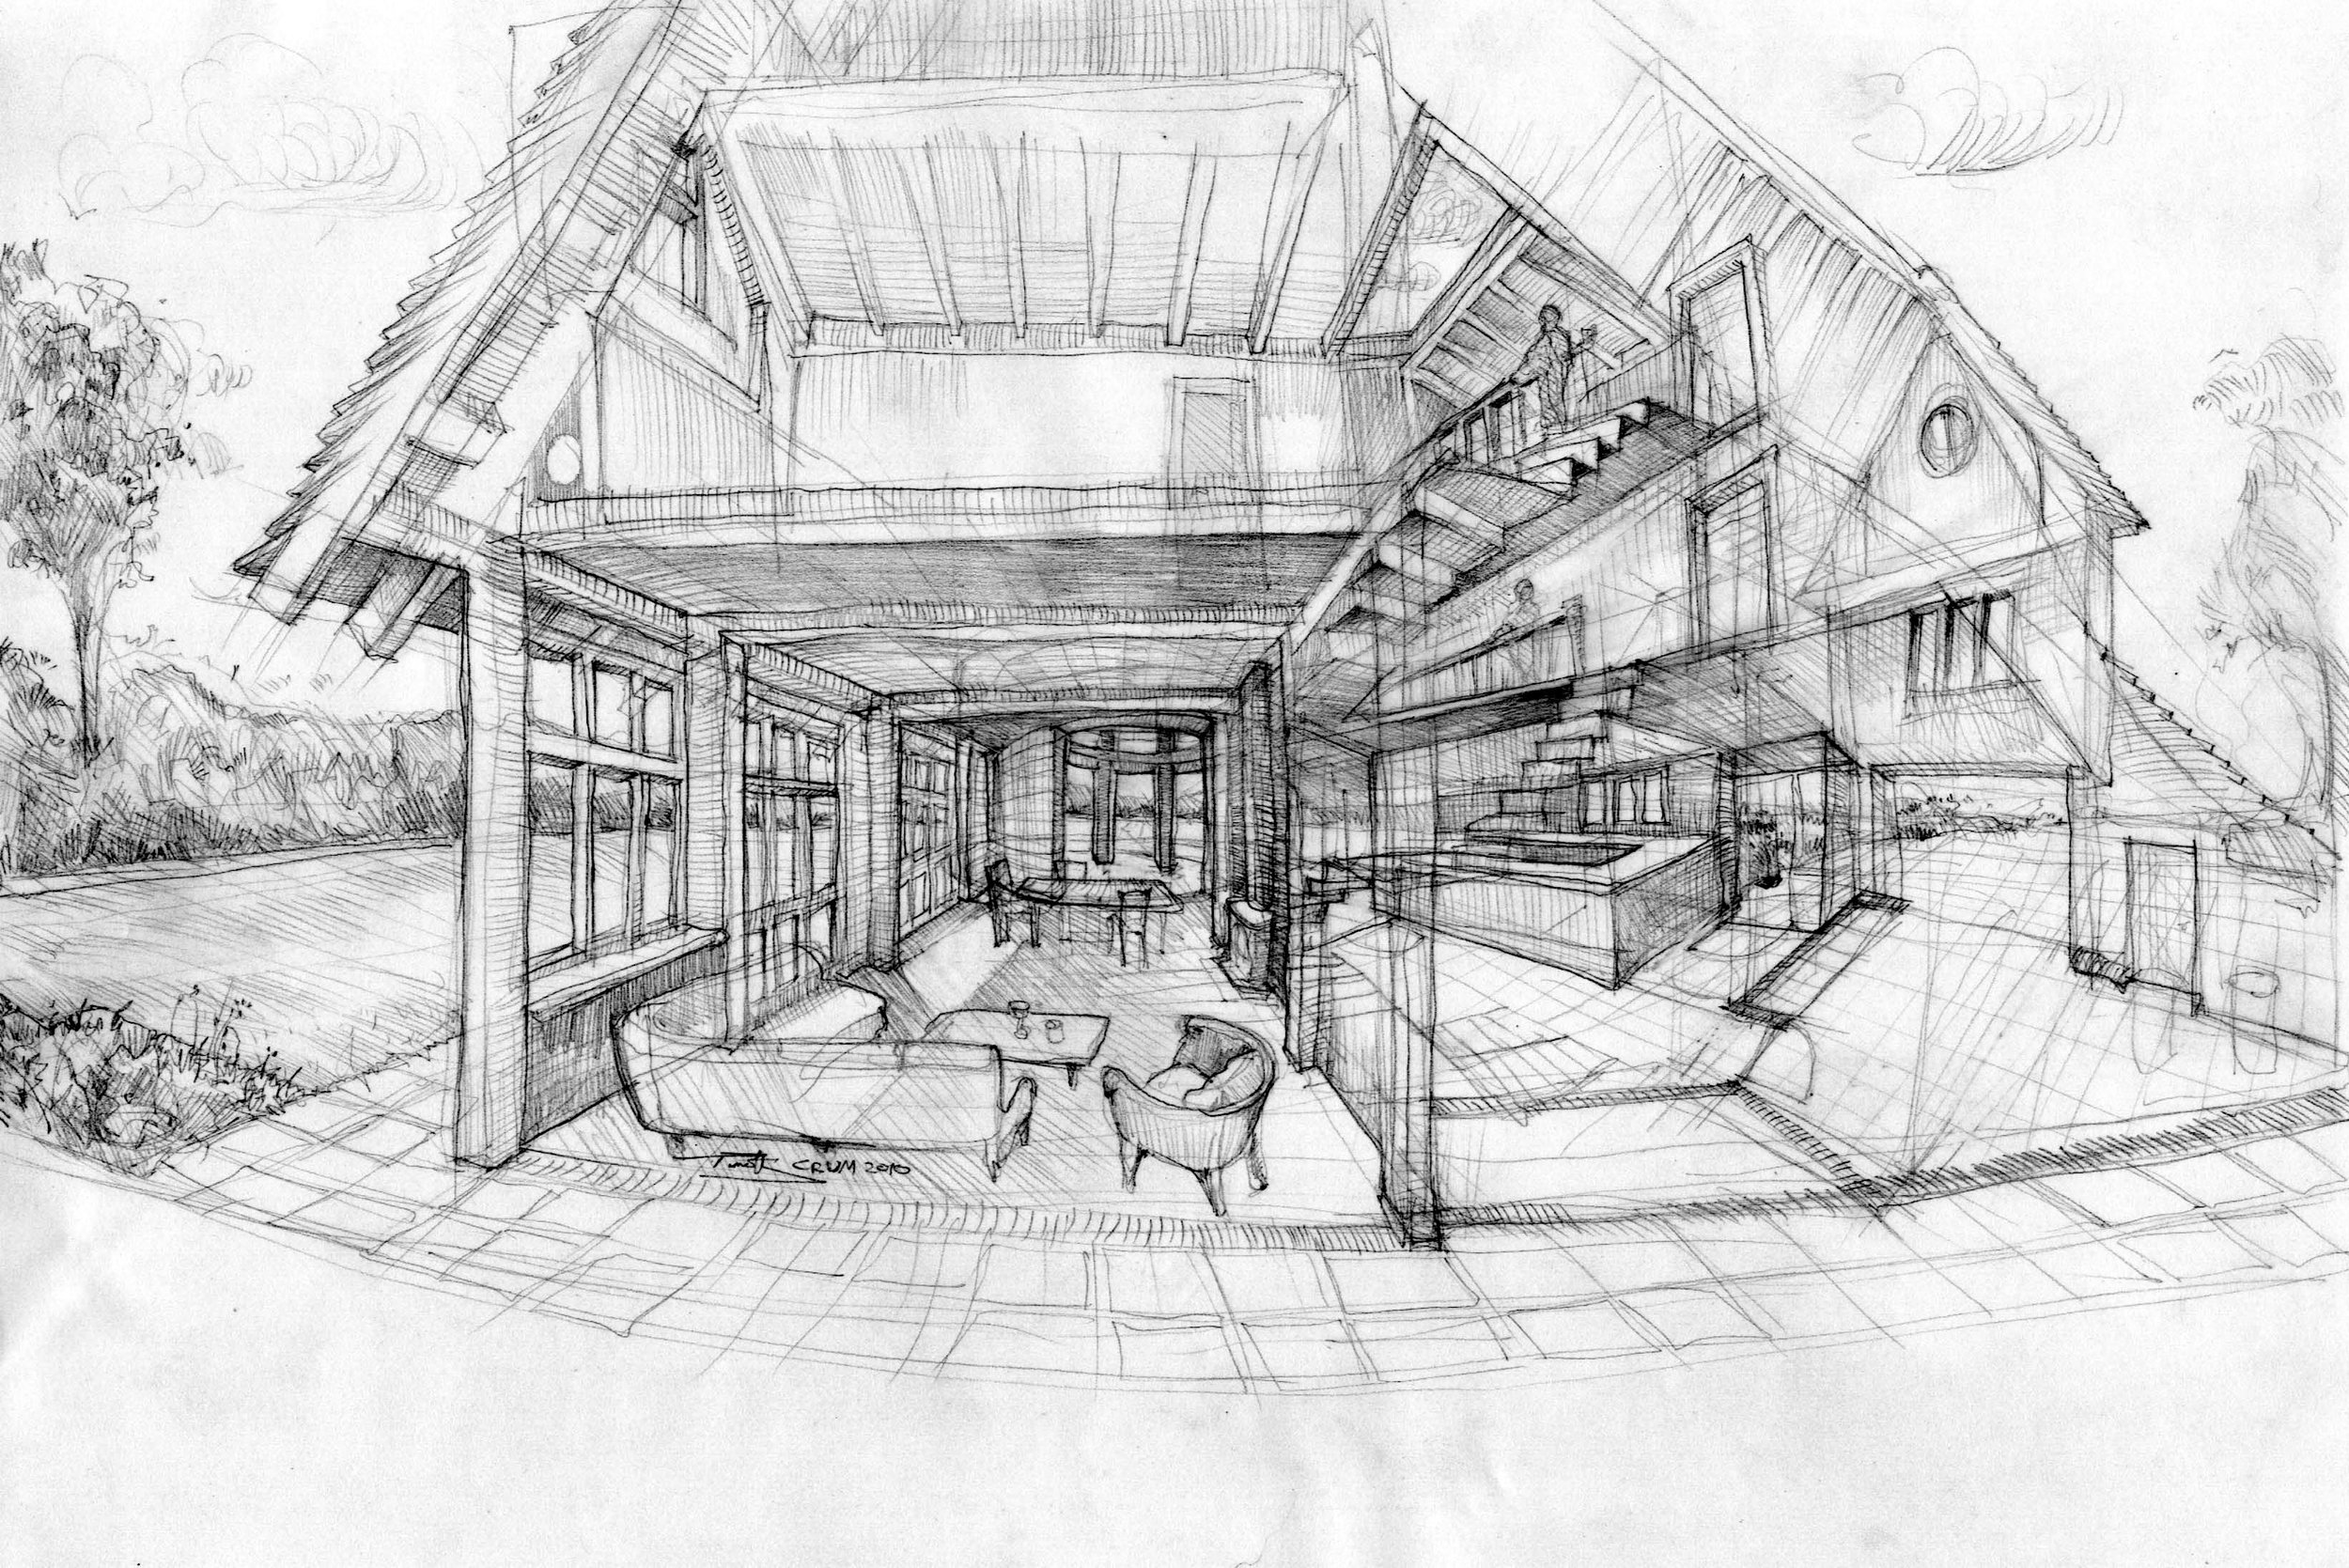 FINEarchitecture_ErnleRoad_Sketch_03.jpeg